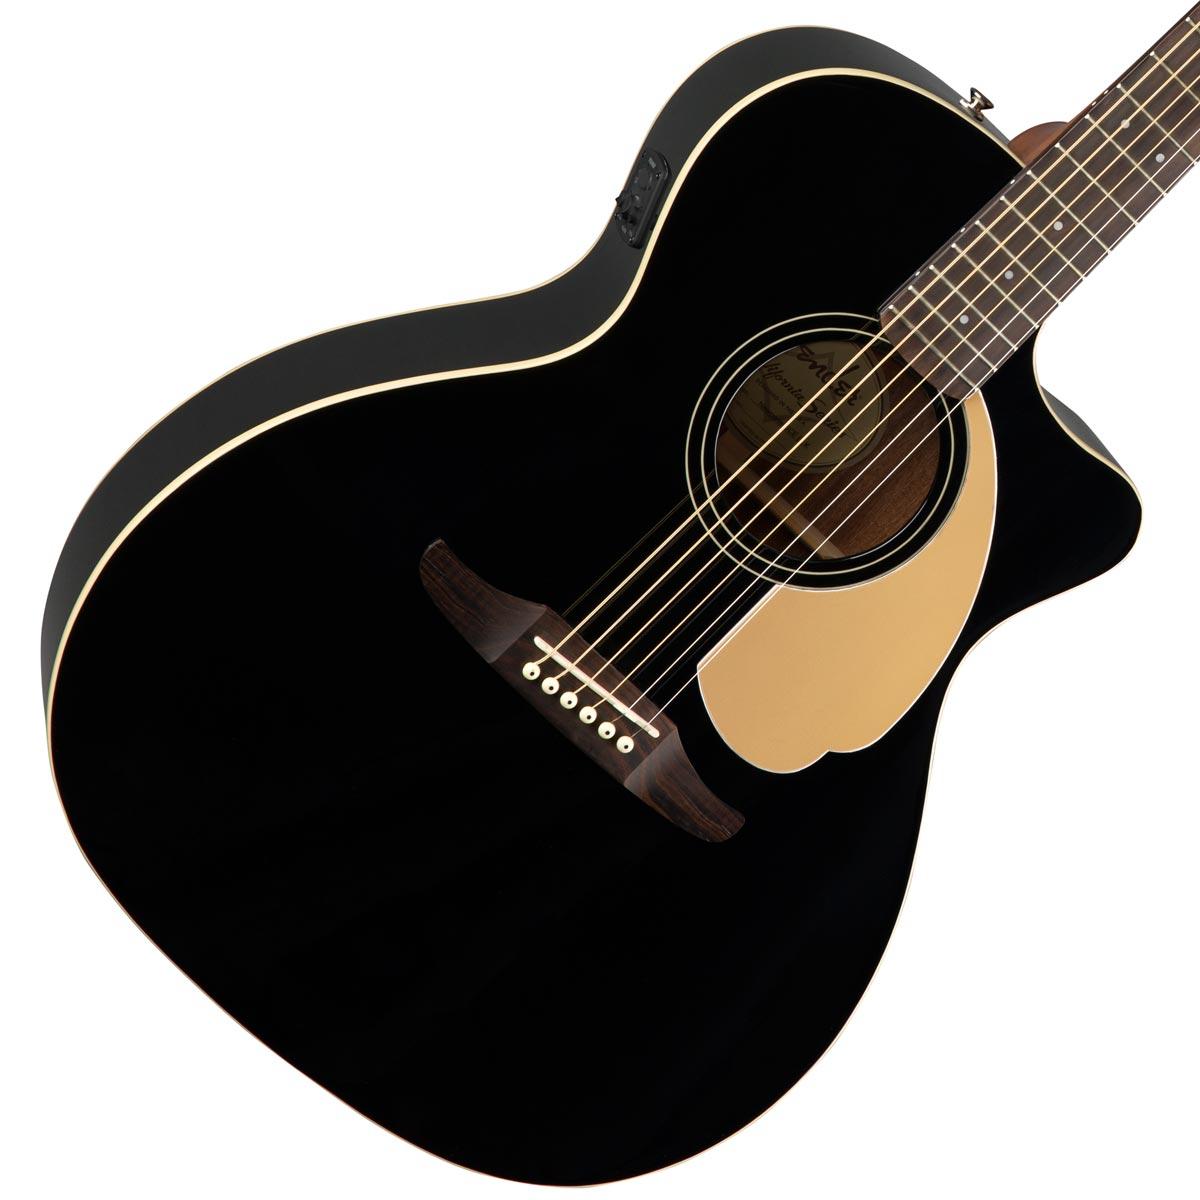 FENDER / NEWPORTER PLAYER Jetty Black (JTB) 【CALIFORNIA SERIES】フェンダー アコースティックギター【新宿店】